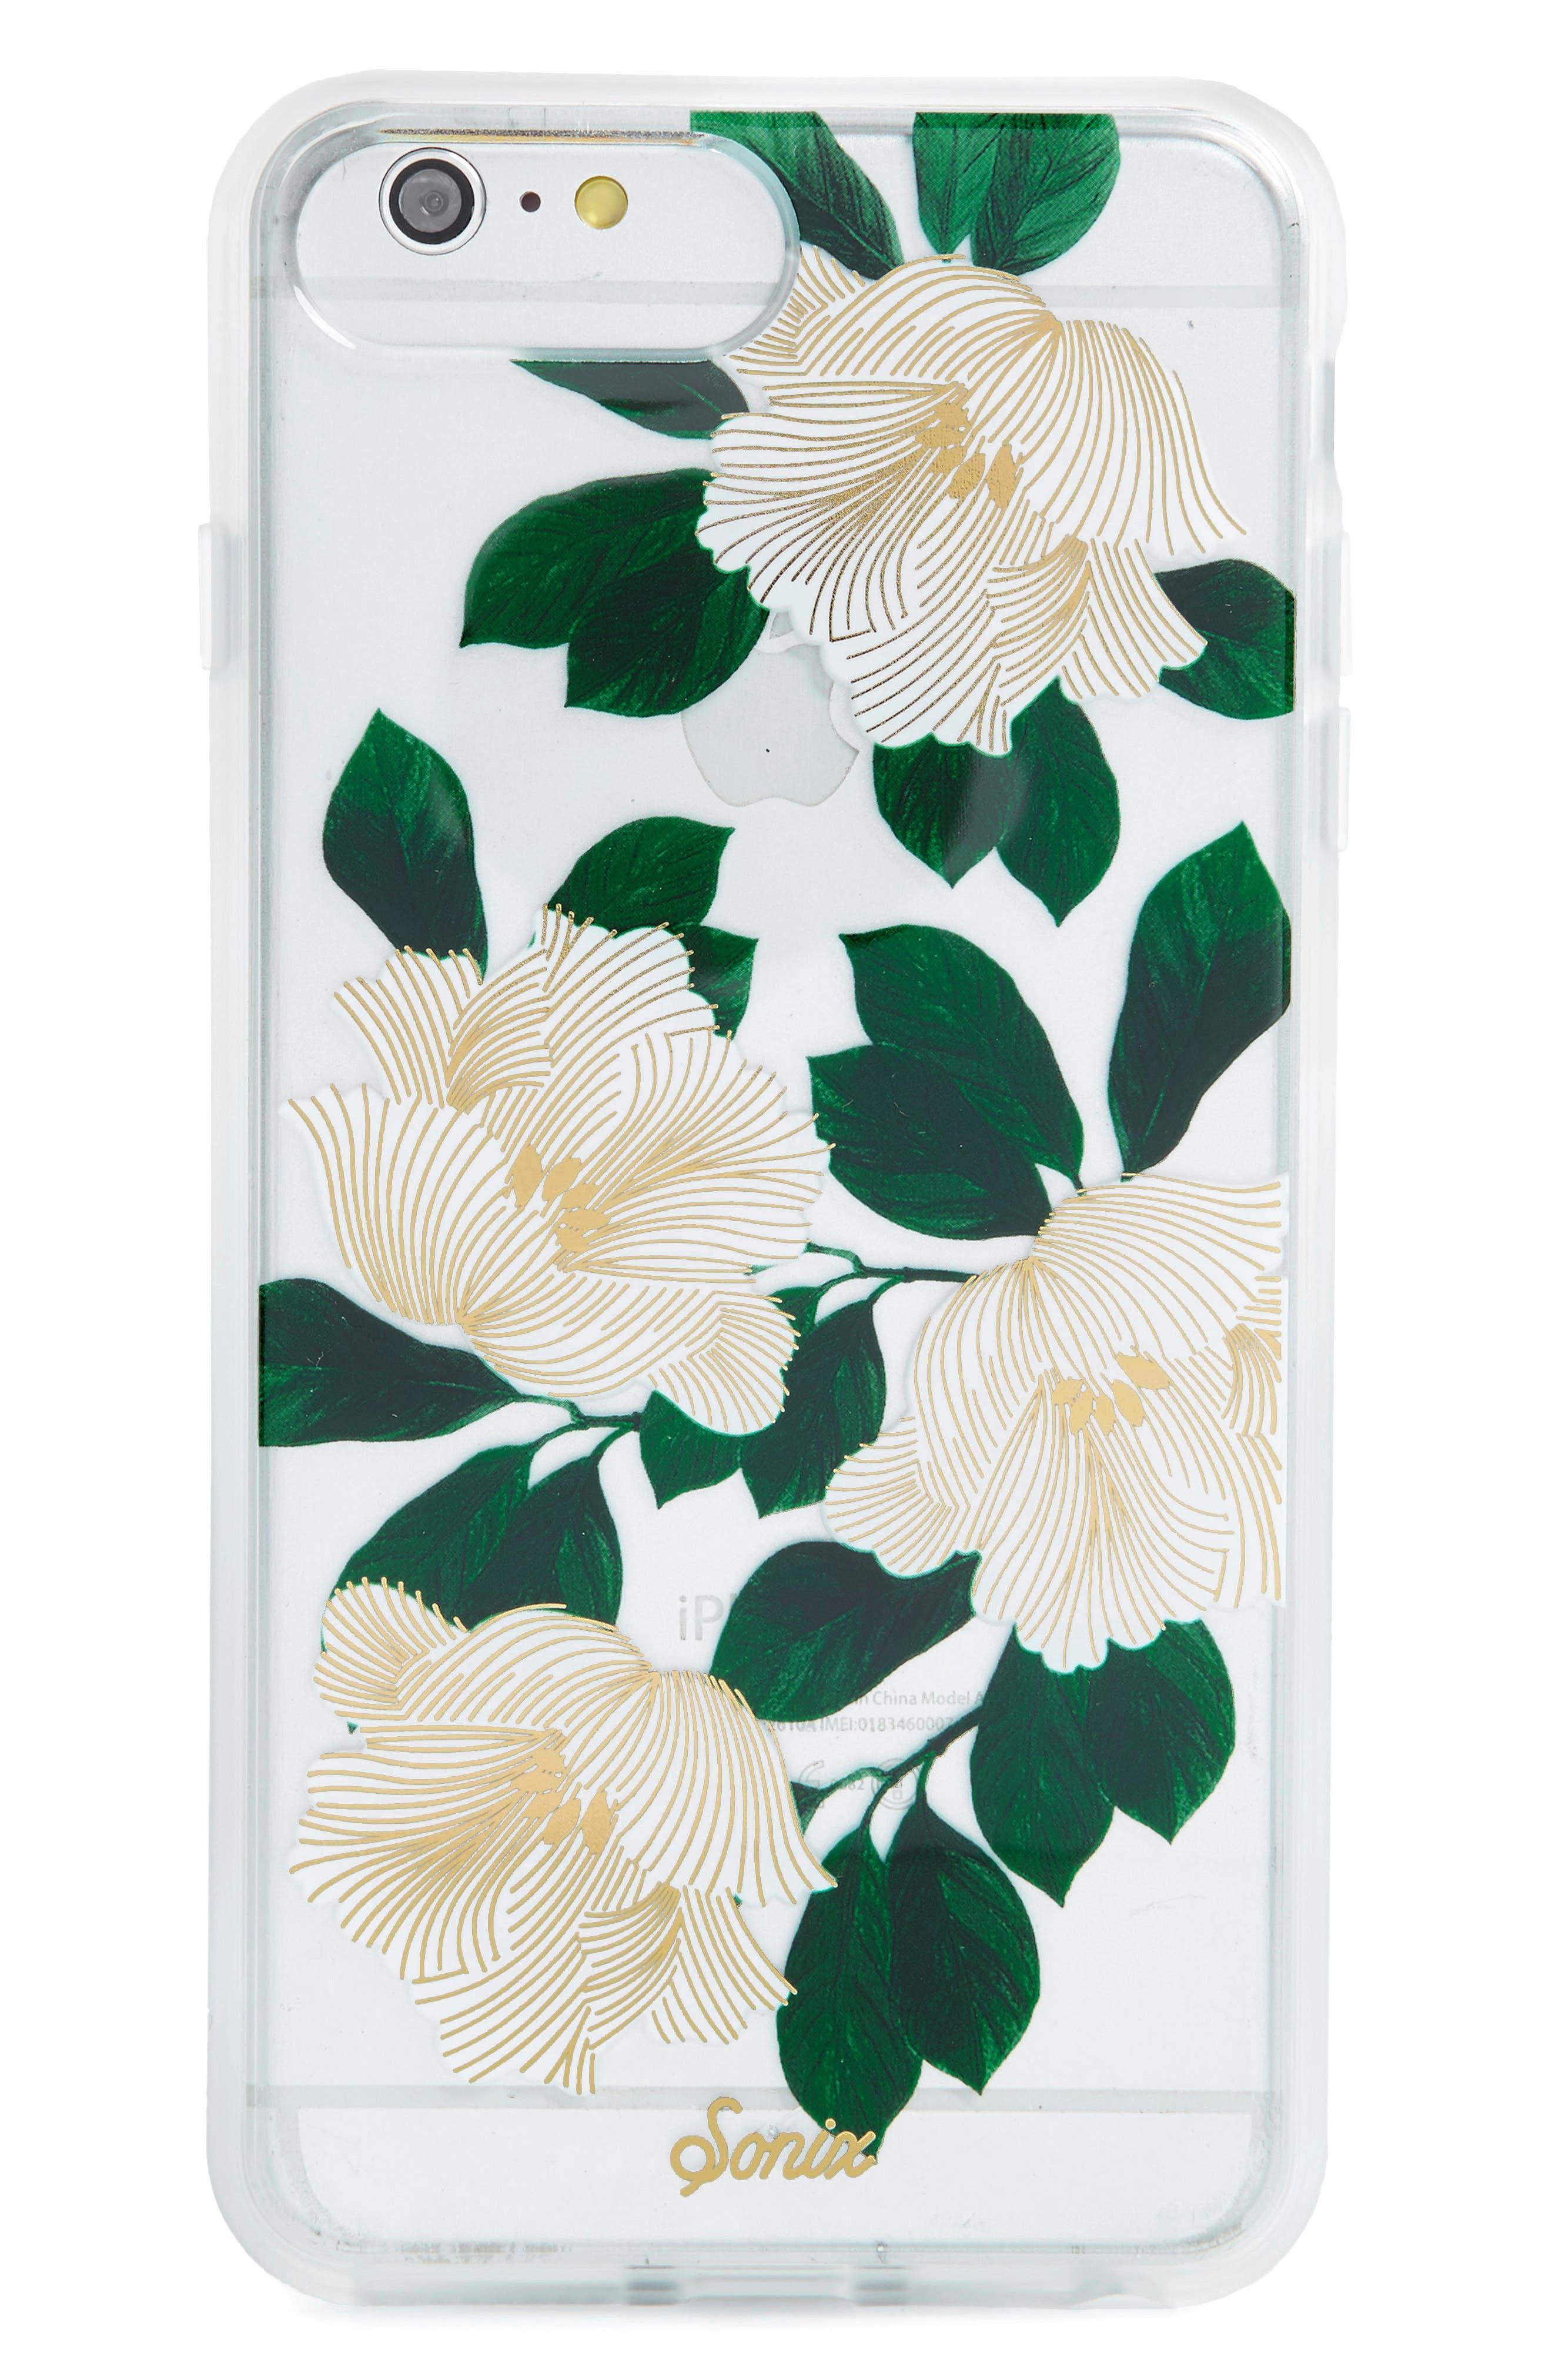 Main Image - Sonix Tropical Deco iPhone 6/6s/7/8 & 6/6s/7/8 Plus Case